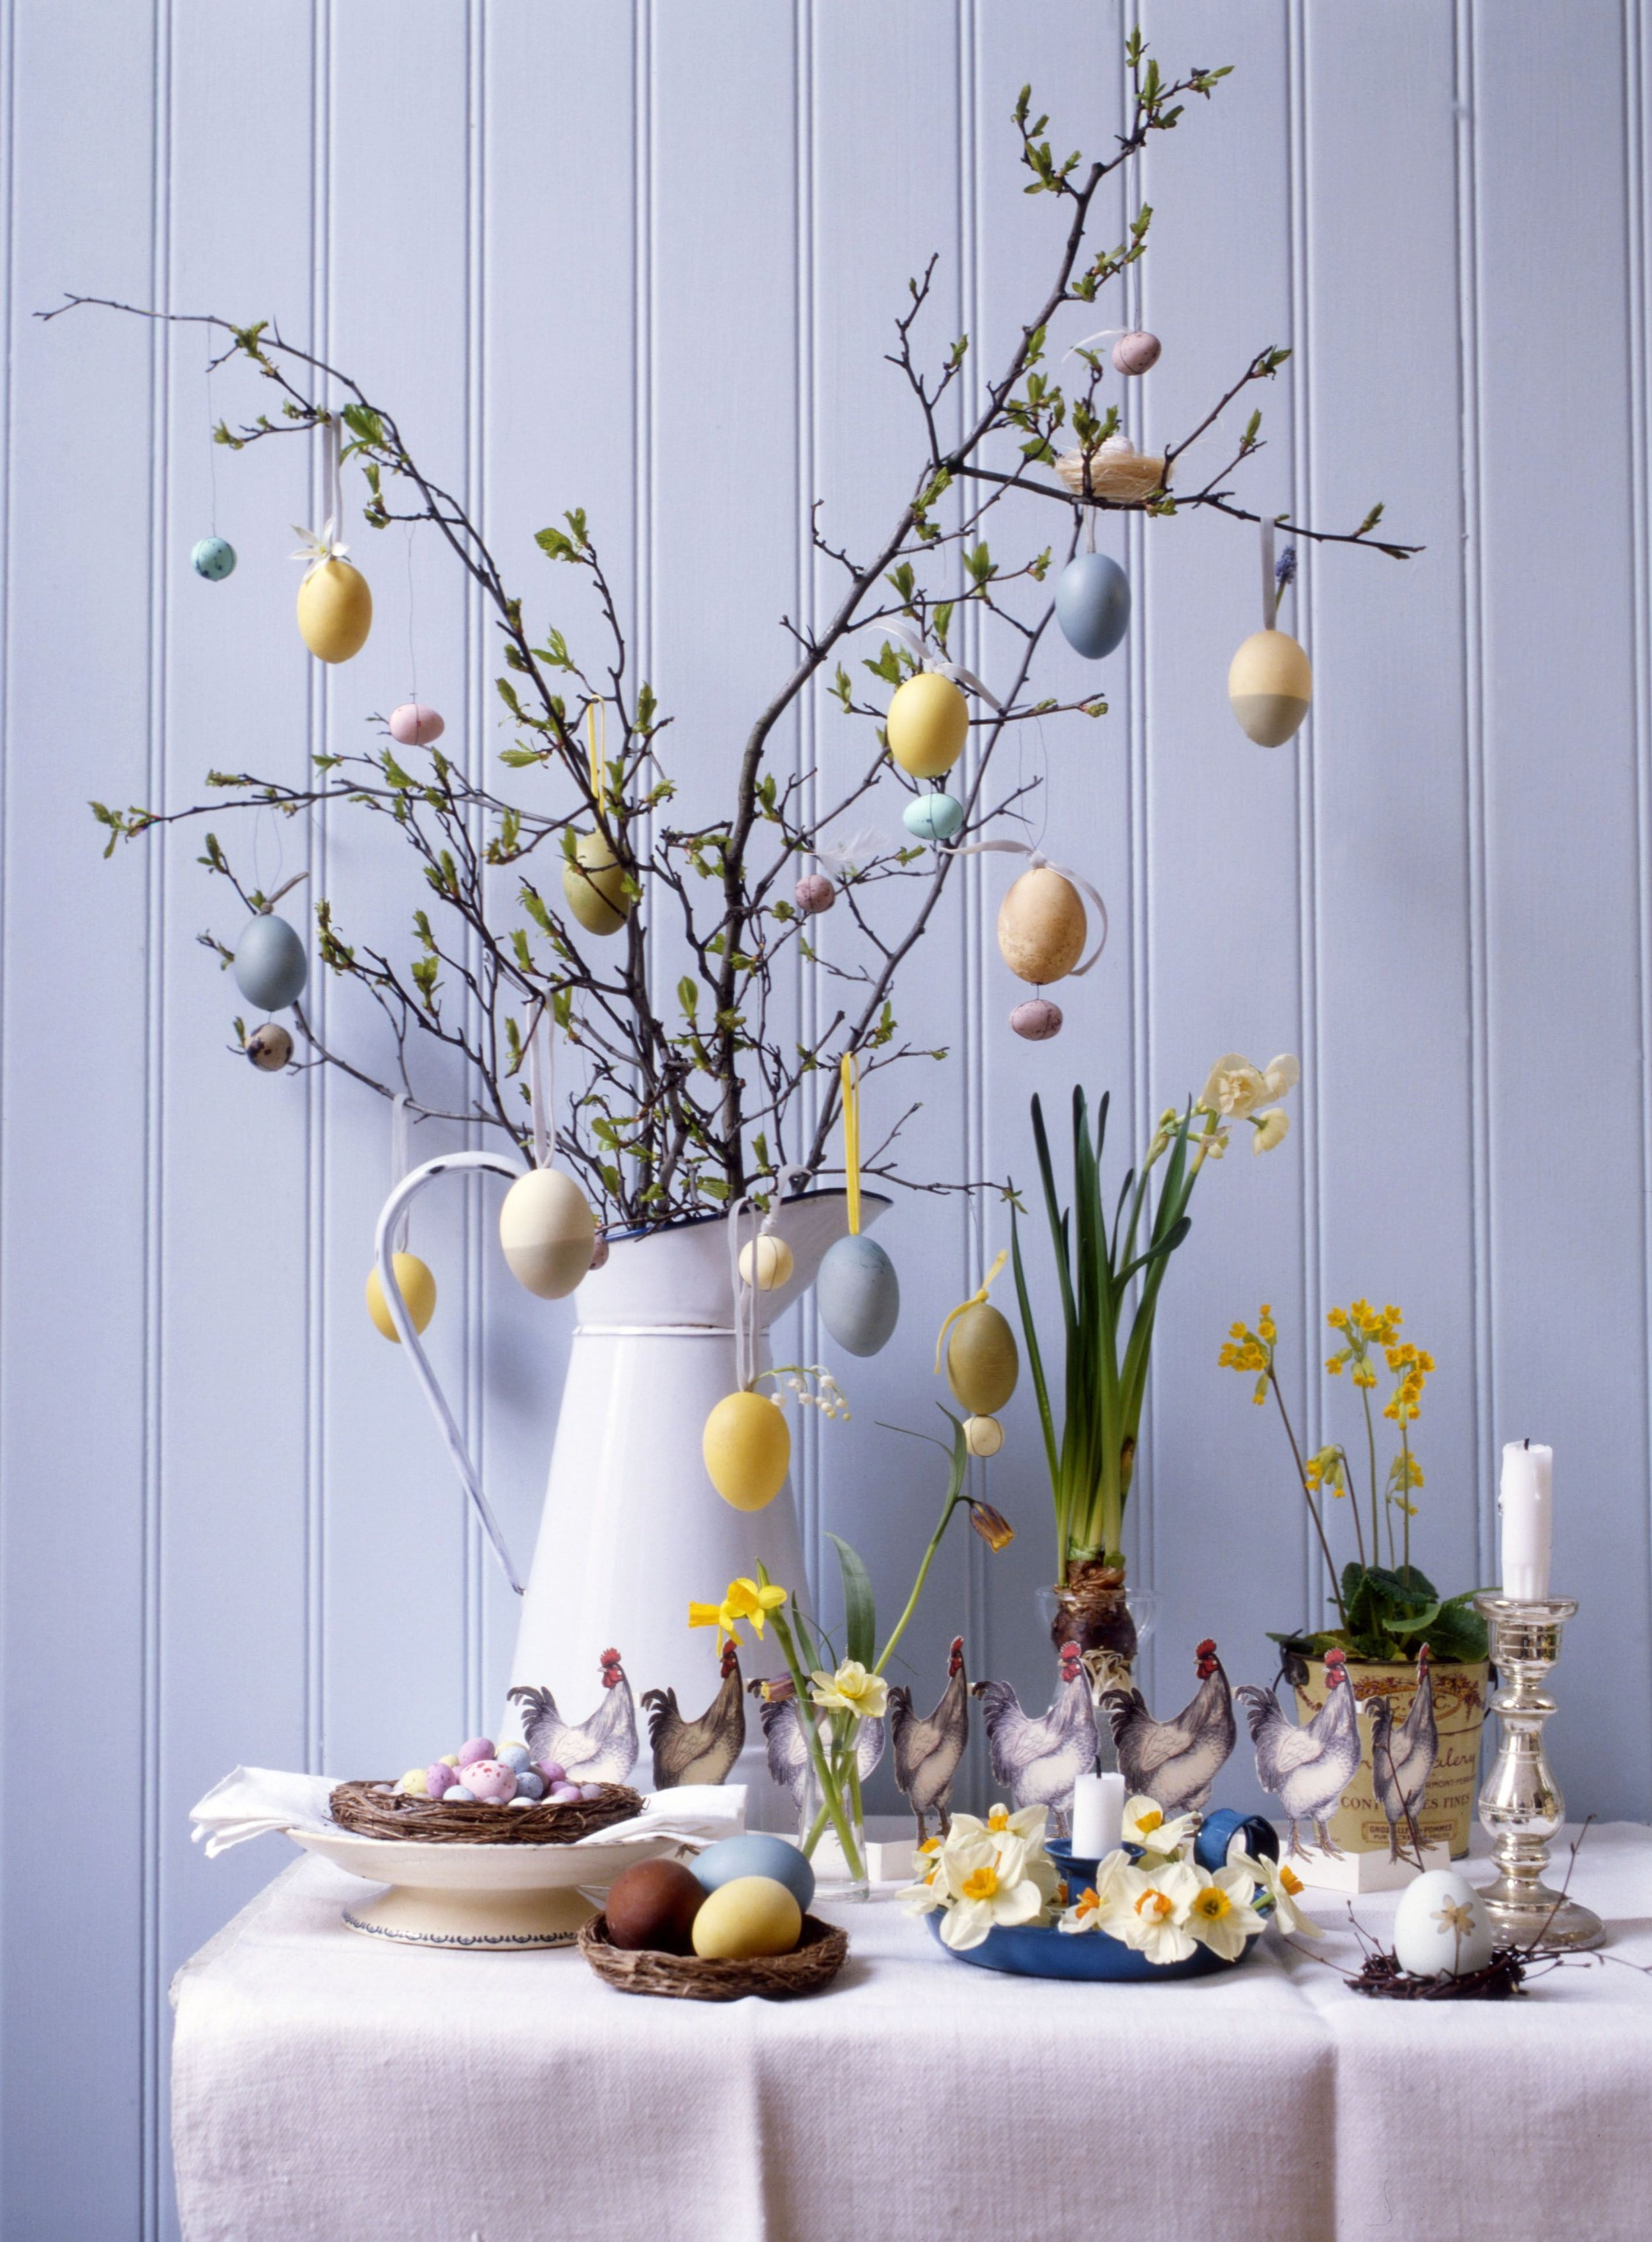 Eggs - £1 each - Salcombe